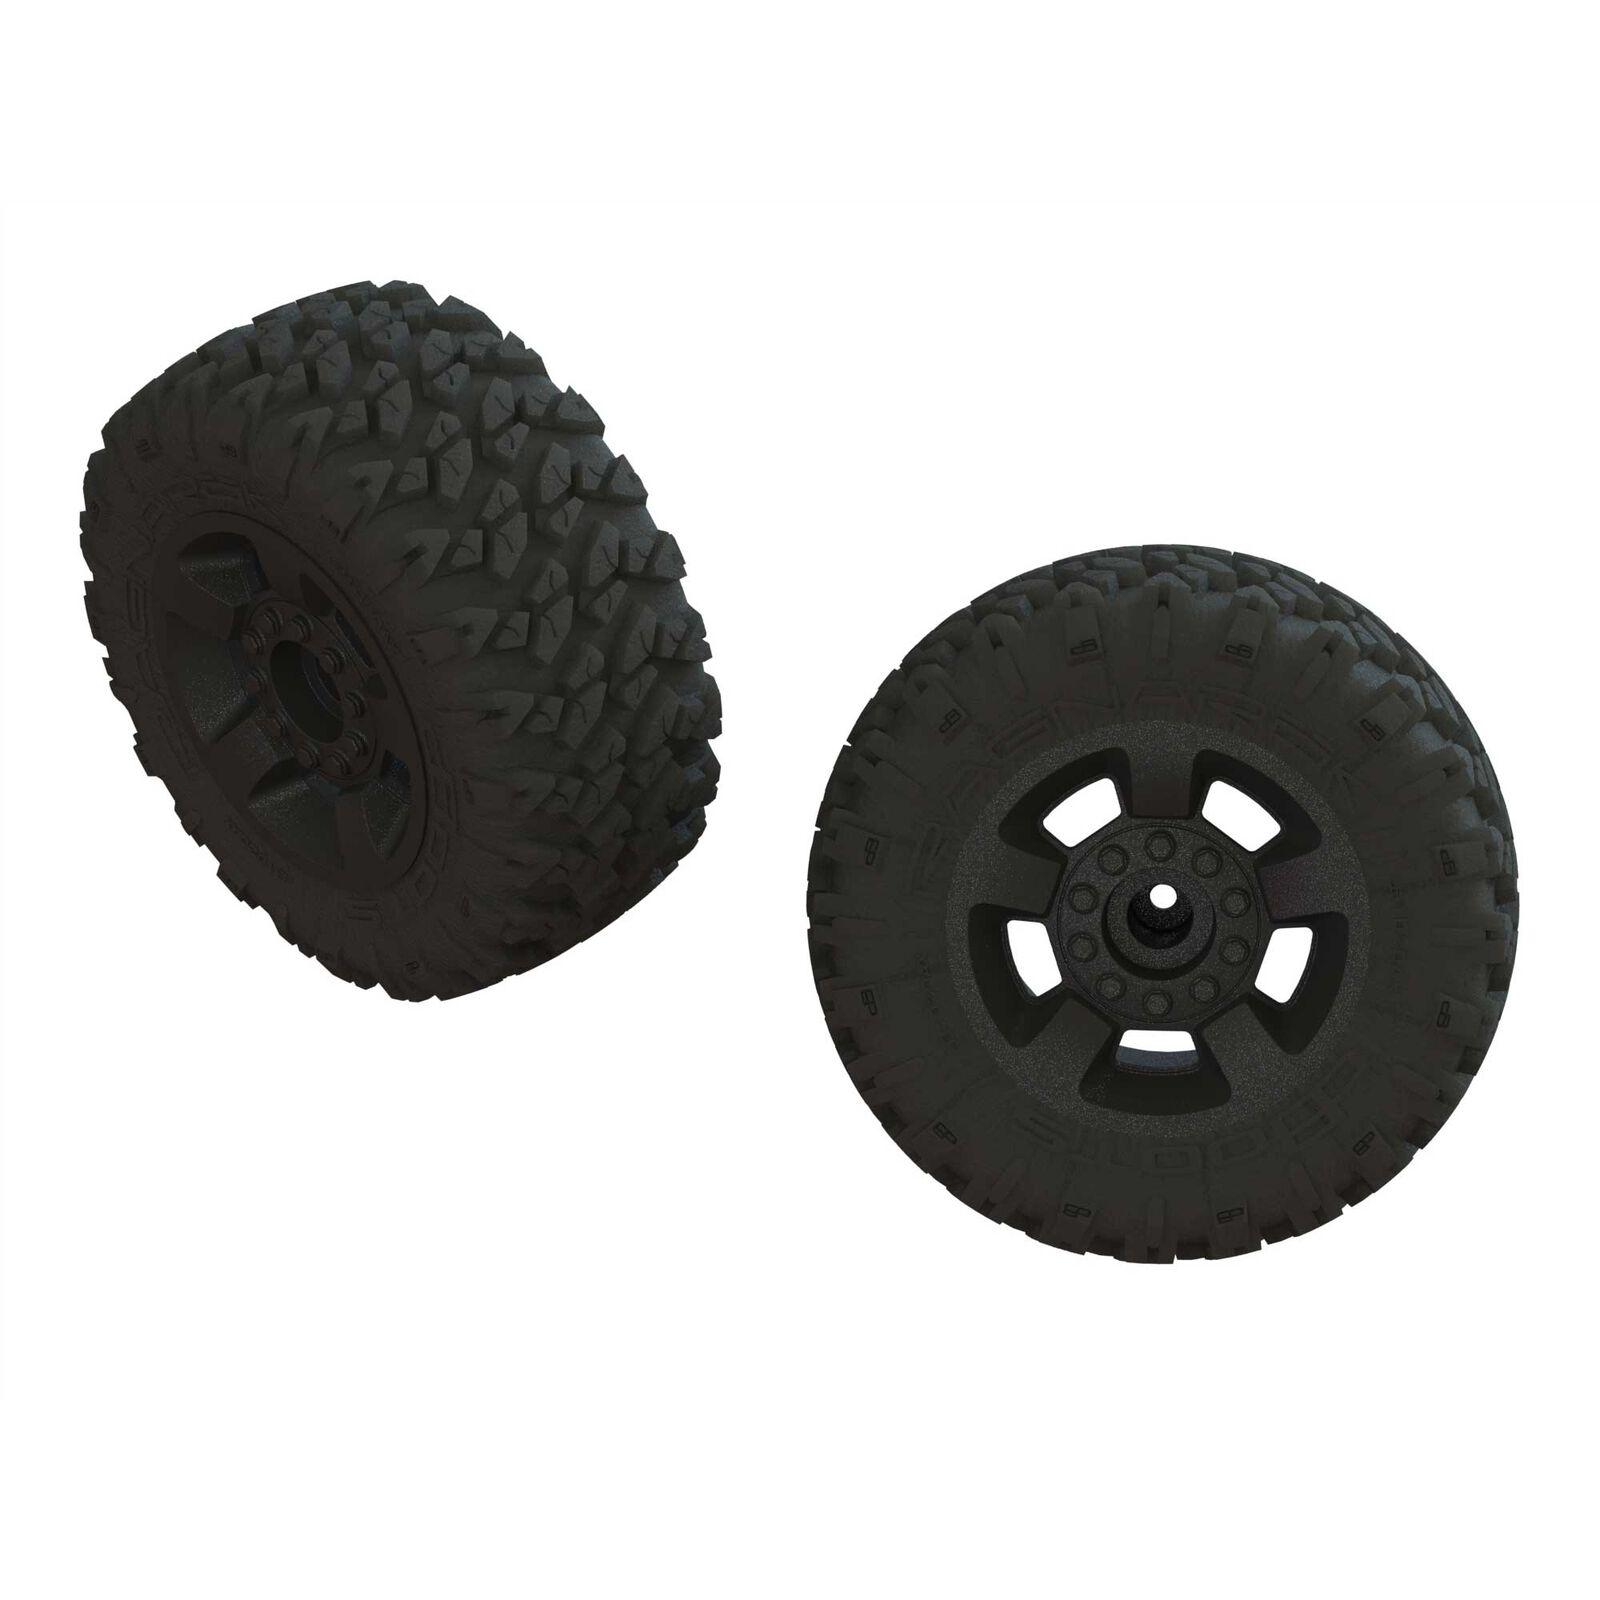 1/8 dBoots RAGNAROK MT Front/Rear 2.8 Pre-Mounted Tires, 14mm Hex, Black (2)